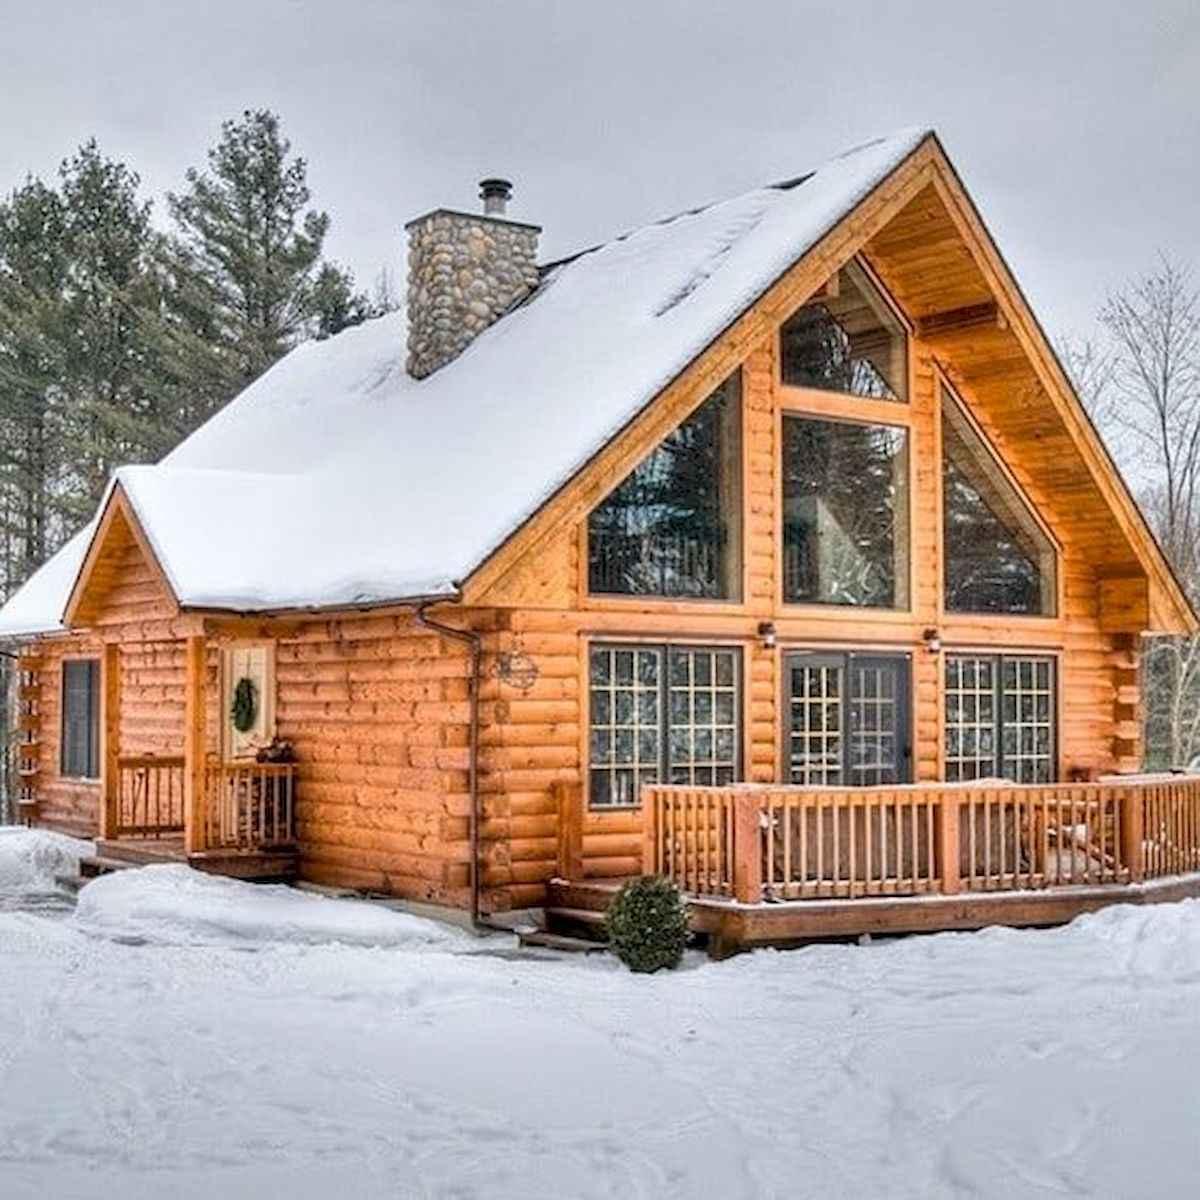 75 Great Log Cabin Homes Plans Design Ideas (43)